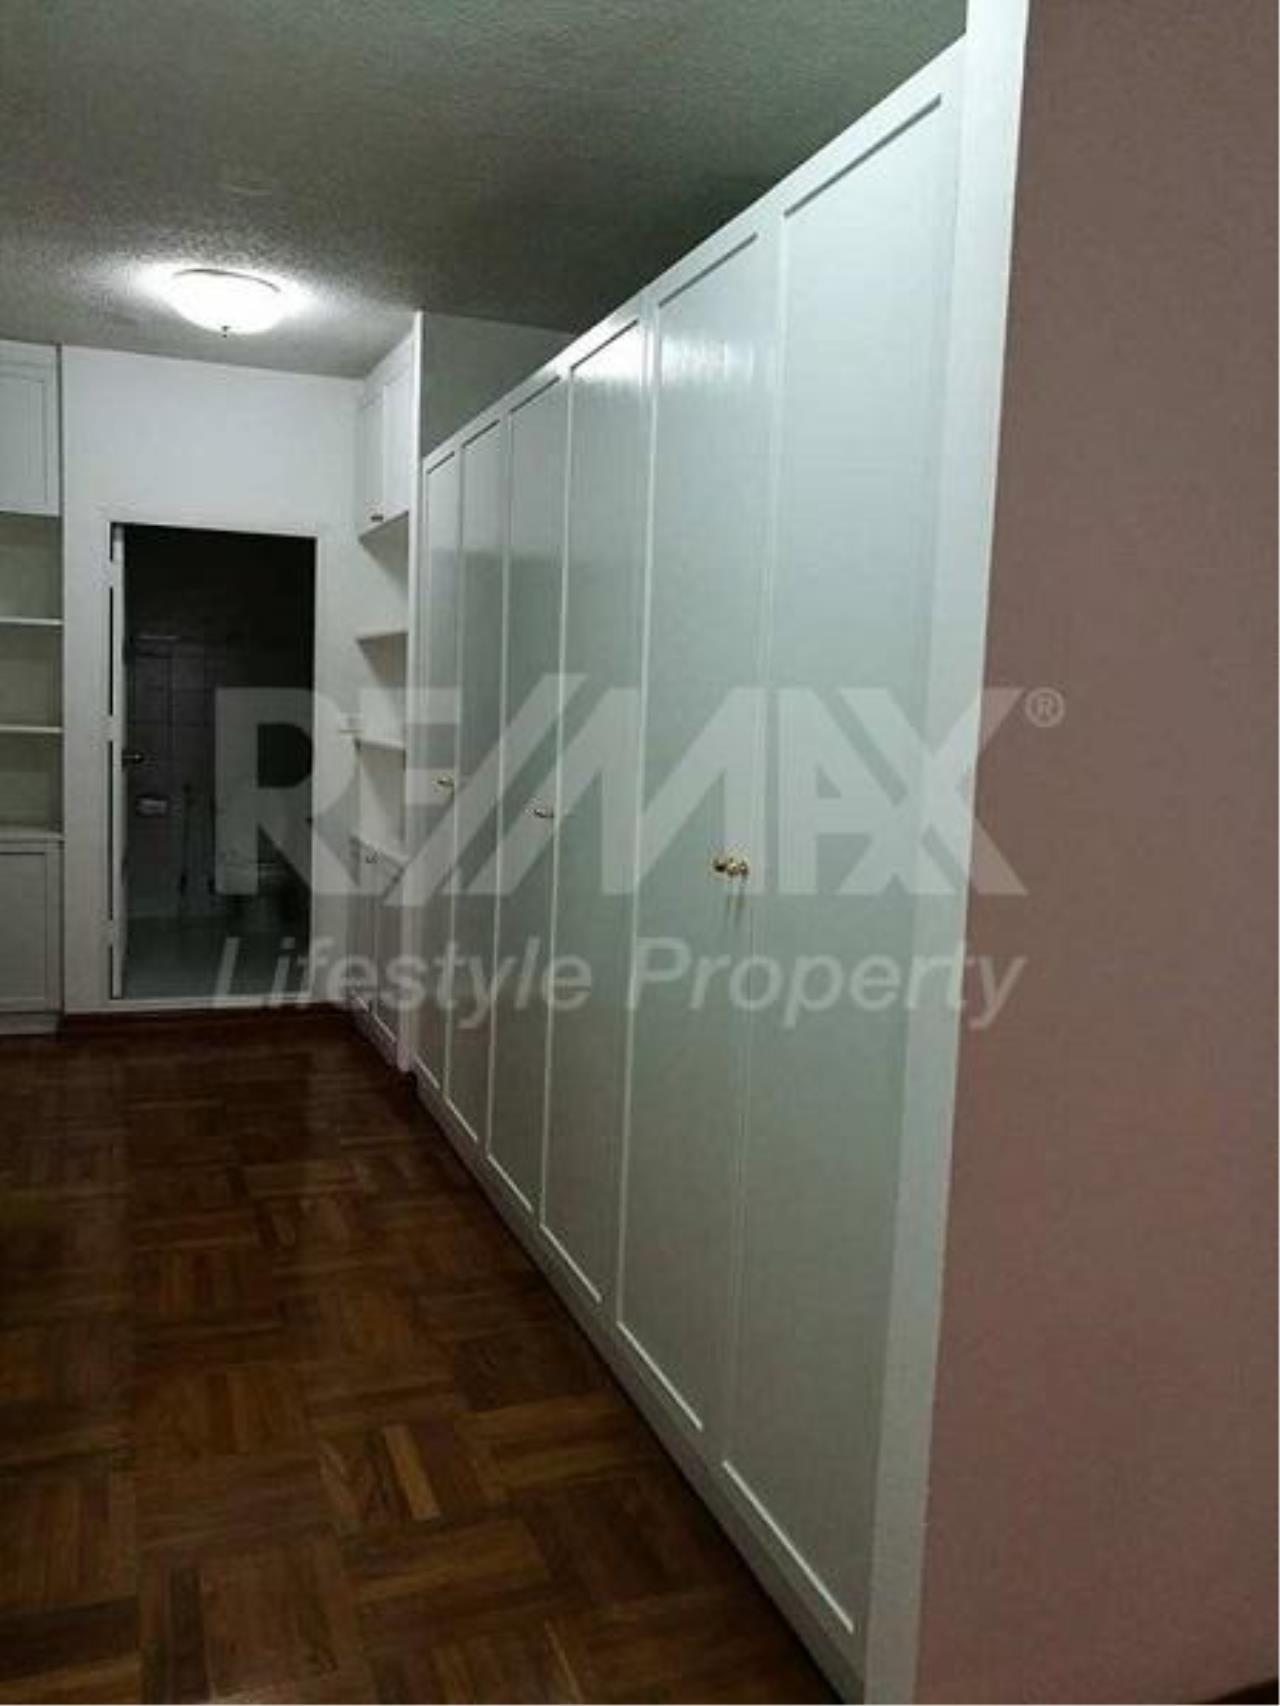 RE/MAX LifeStyle Property Agency's Vanicha Park Langsuan 10